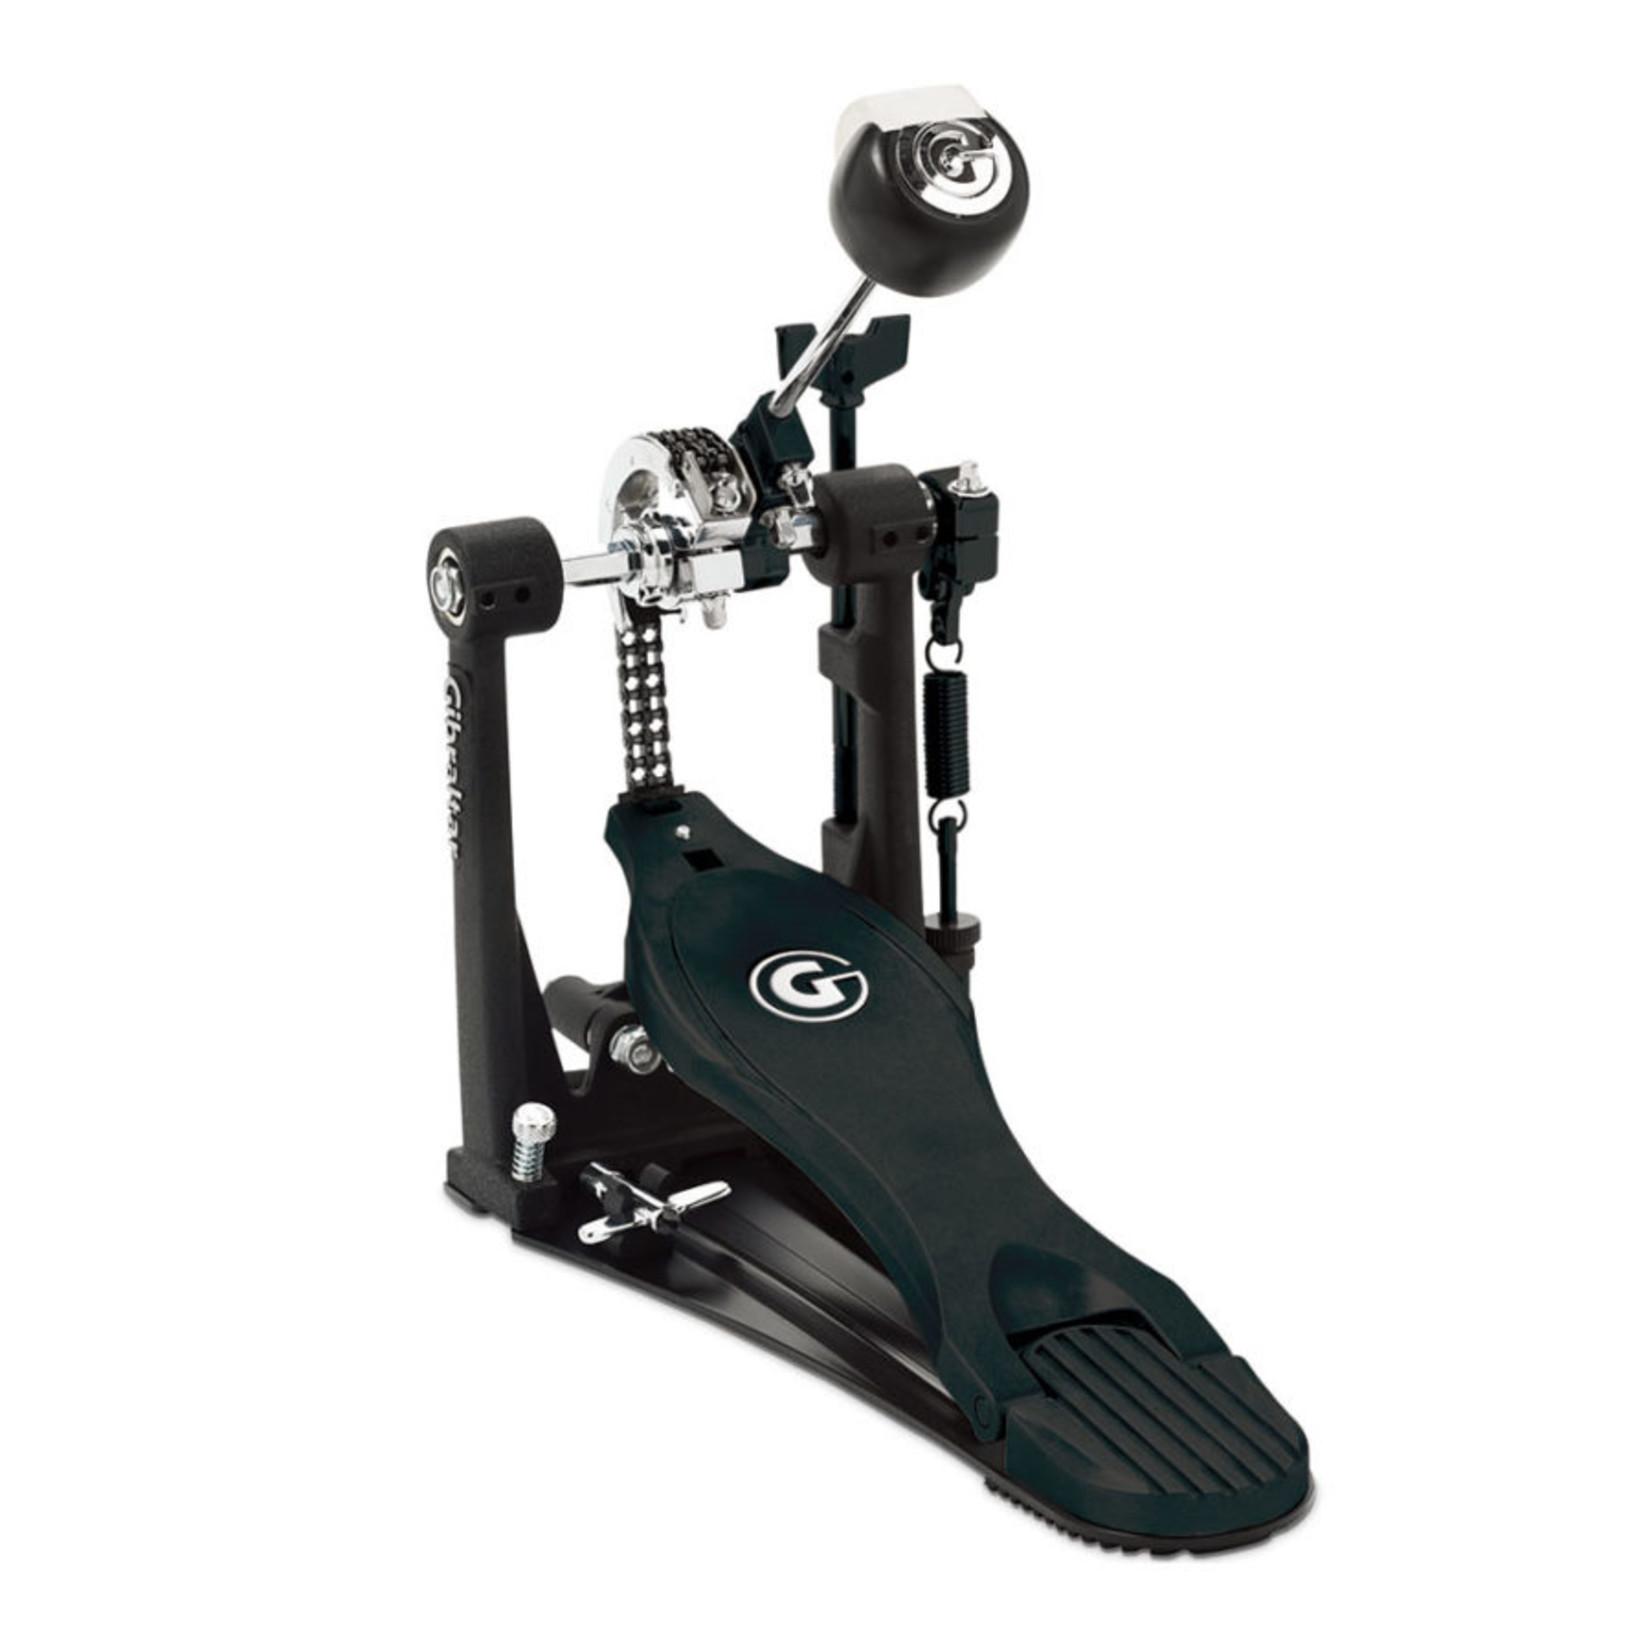 Gibraltar Stealth G Drive Single Pedal